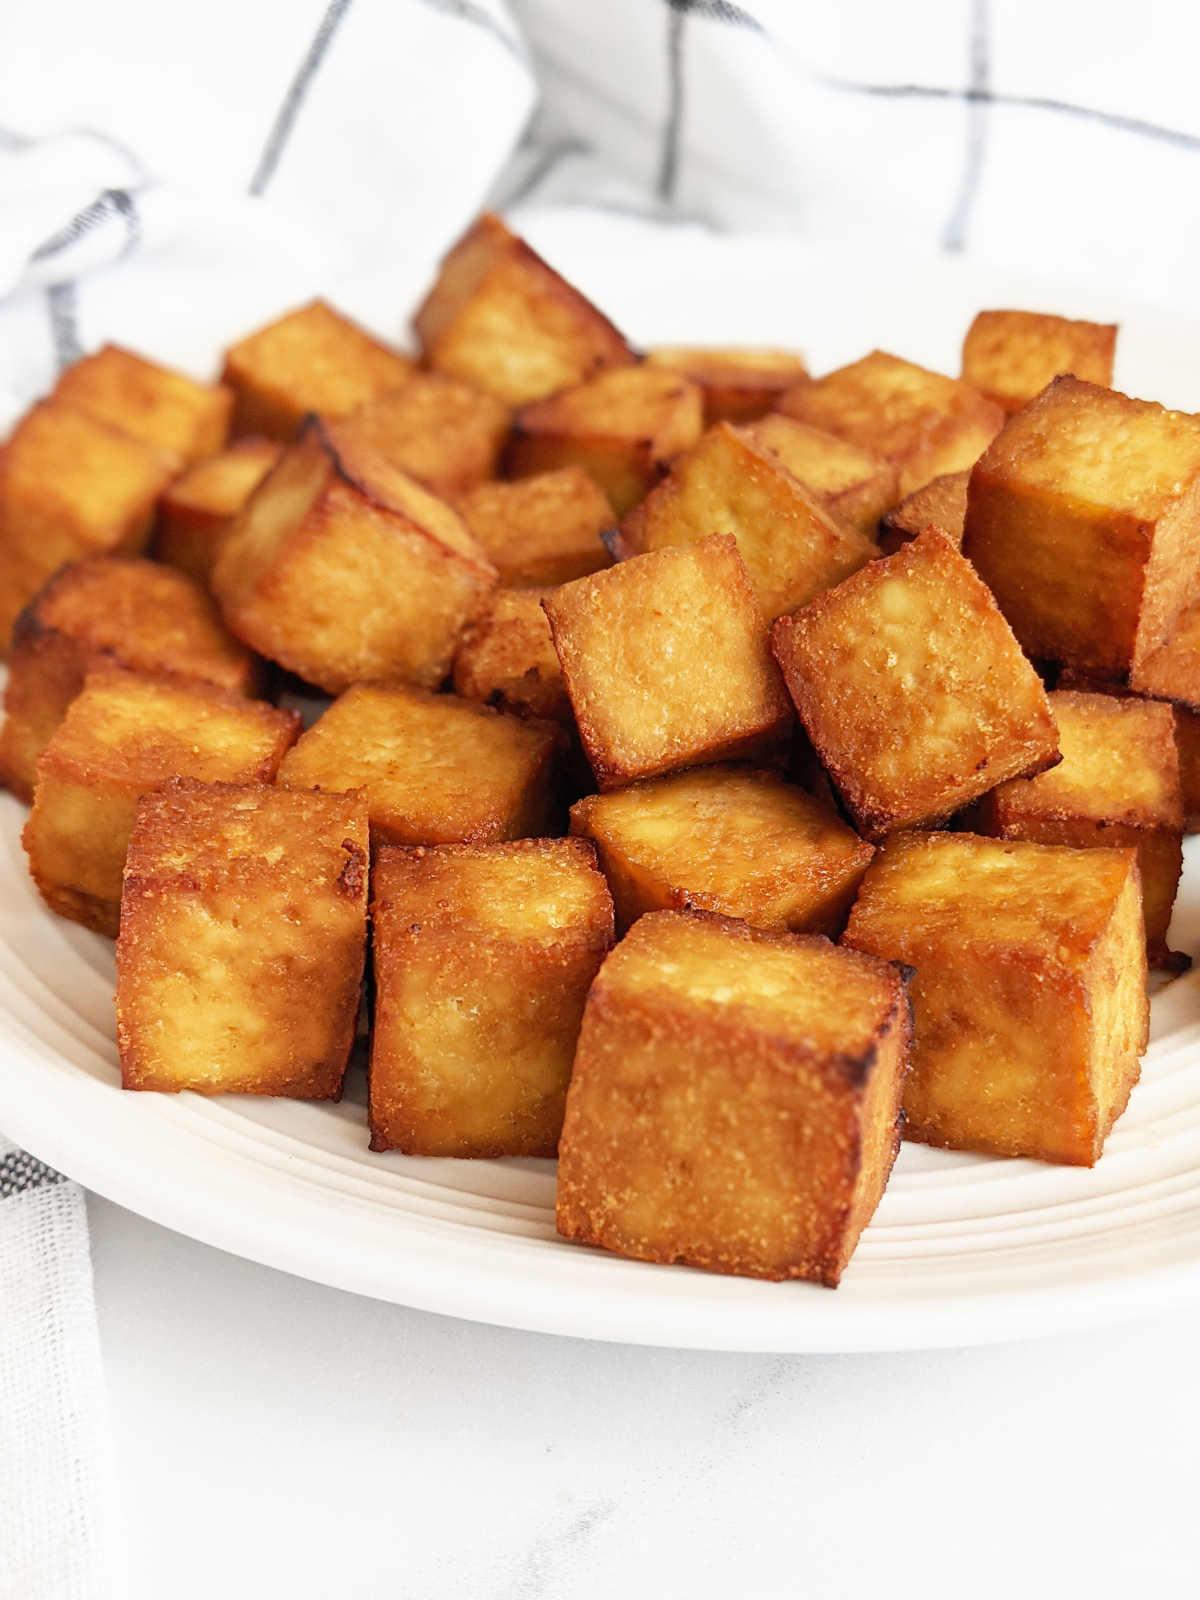 Crispy cubed tofu on a plate.